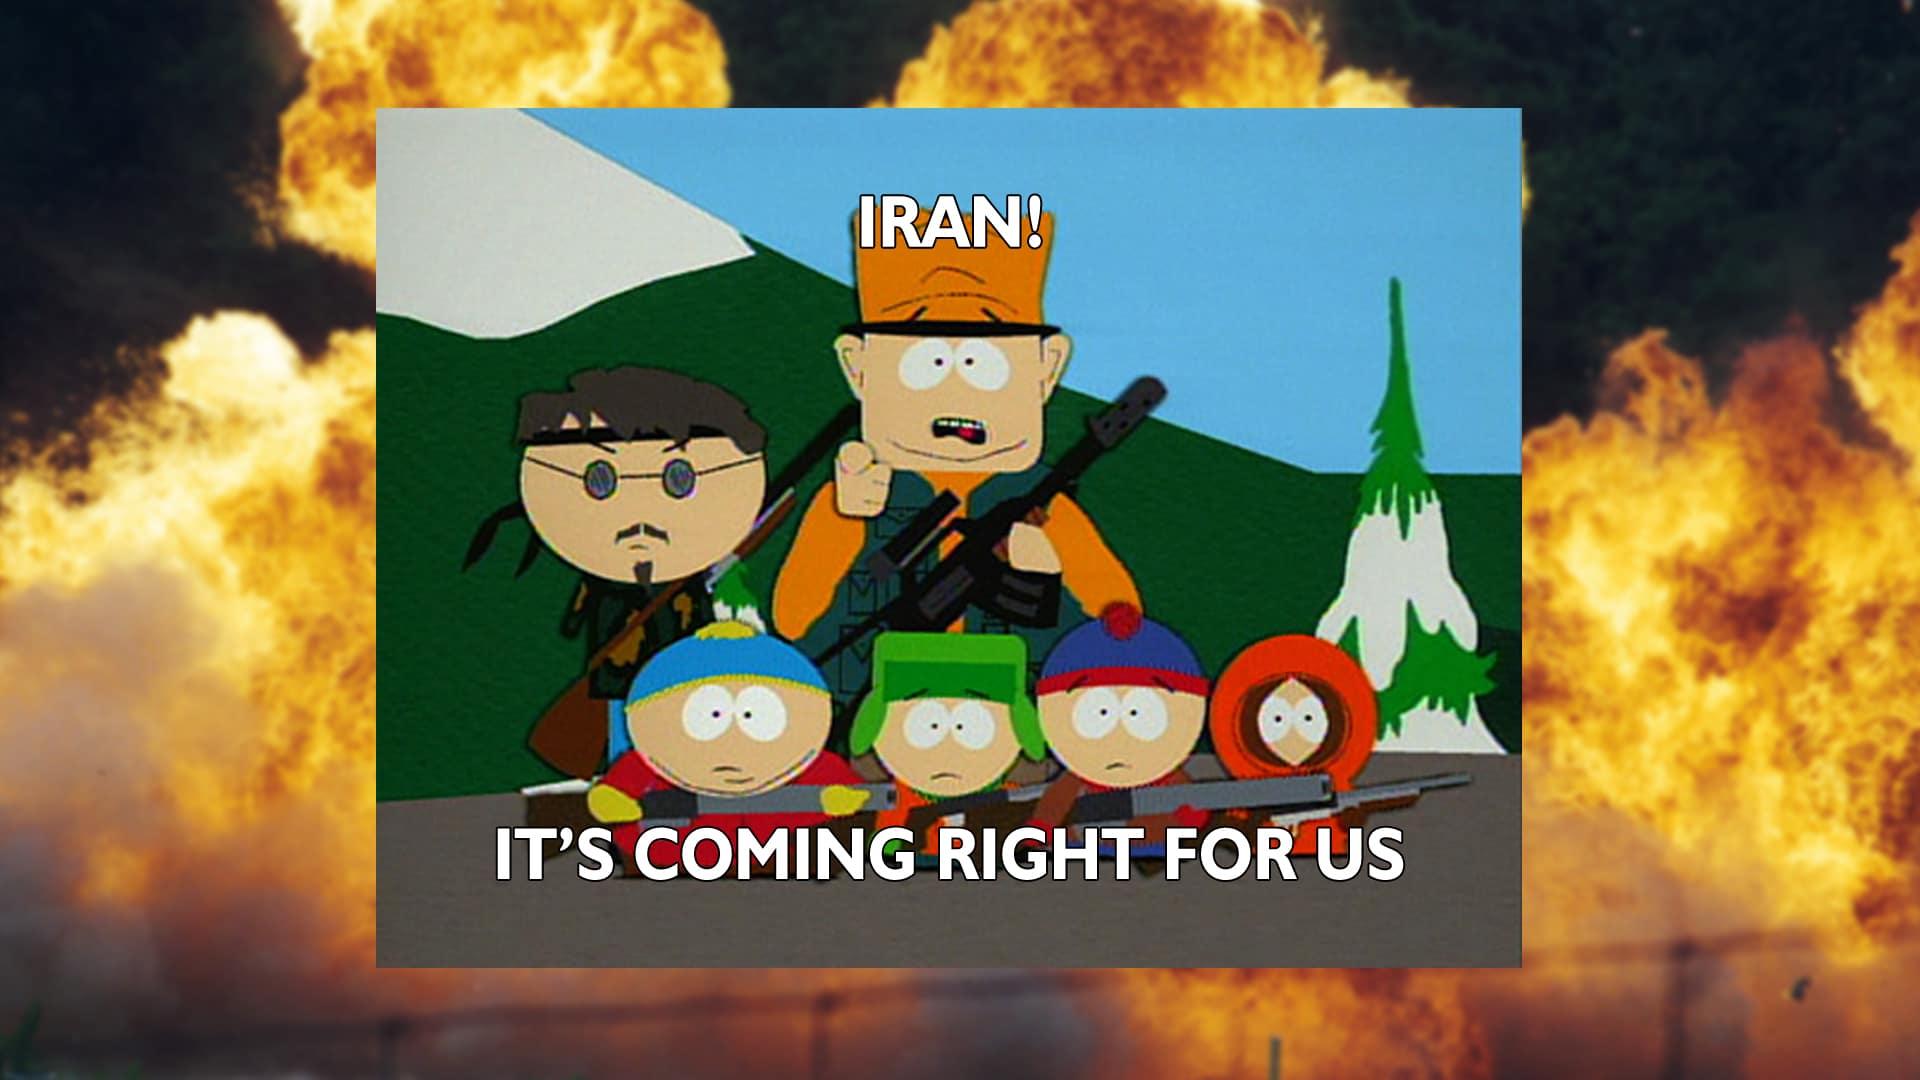 Conservatives-Finally-Get-Their-War-With-Iran